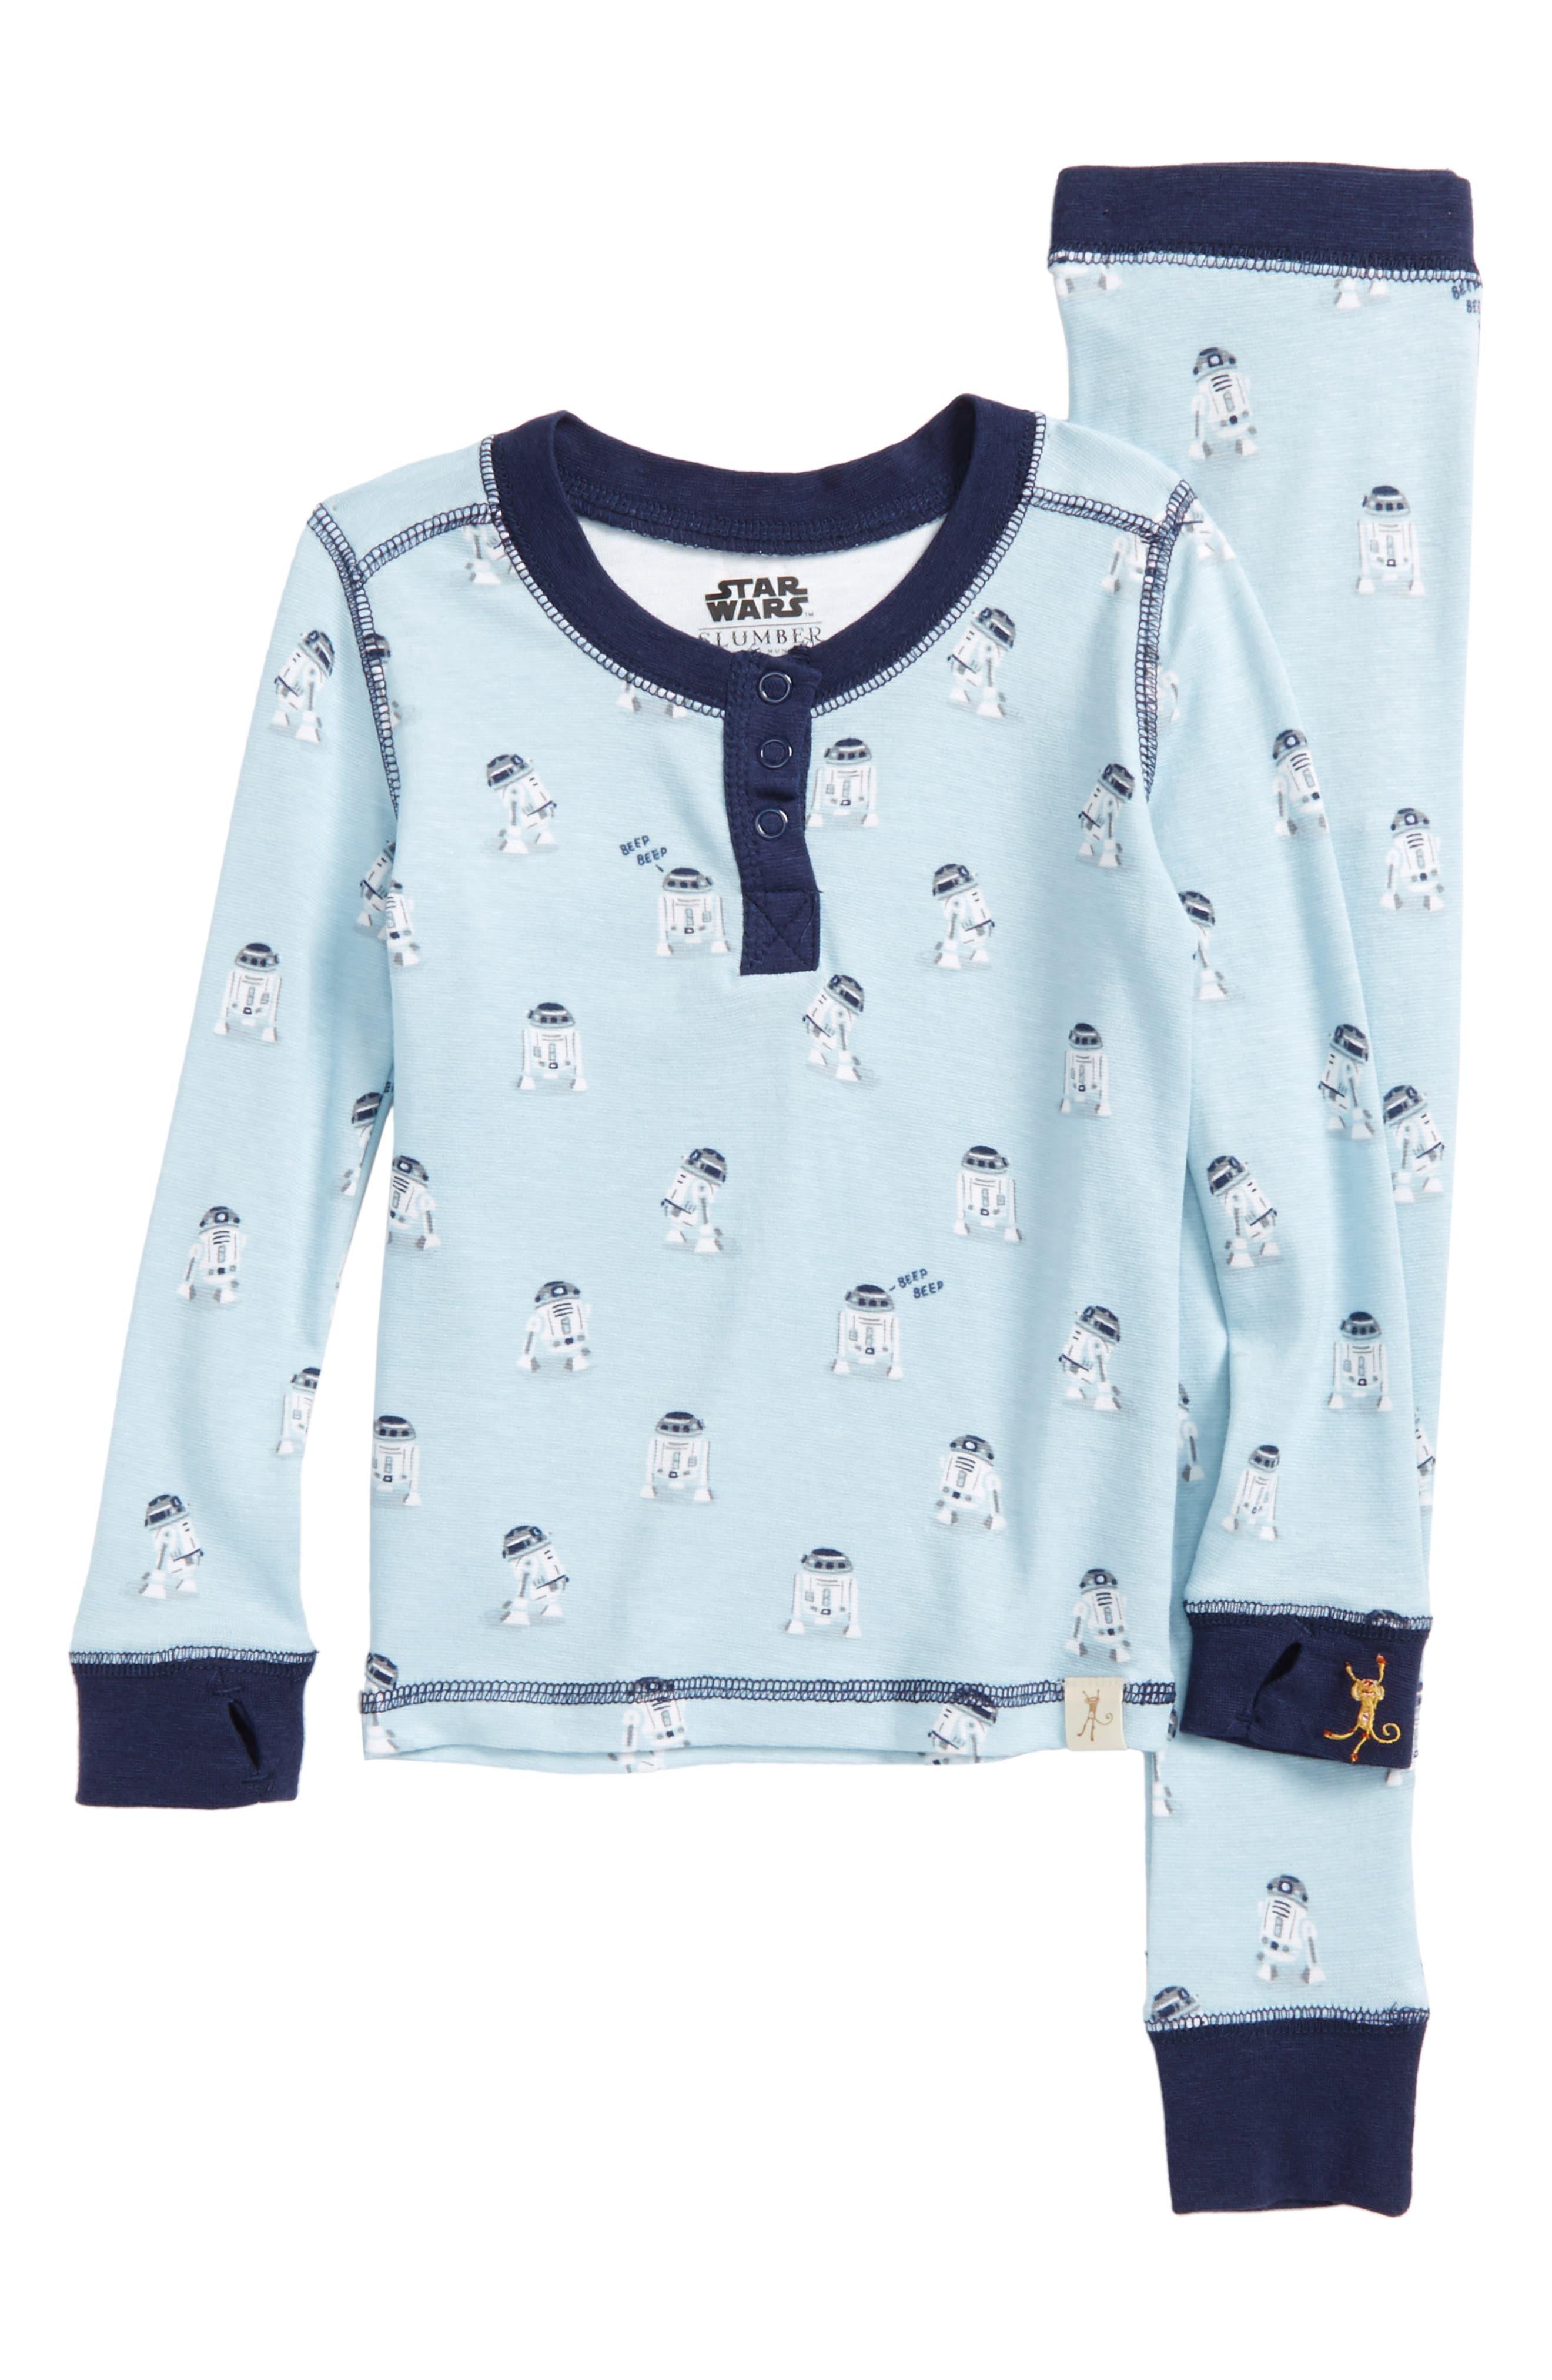 Main Image - Munki Munki Star Wars™ - R2-D2 Fitted Two-Piece Pajamas (Toddler Boys, Little Boys & Big Boys)